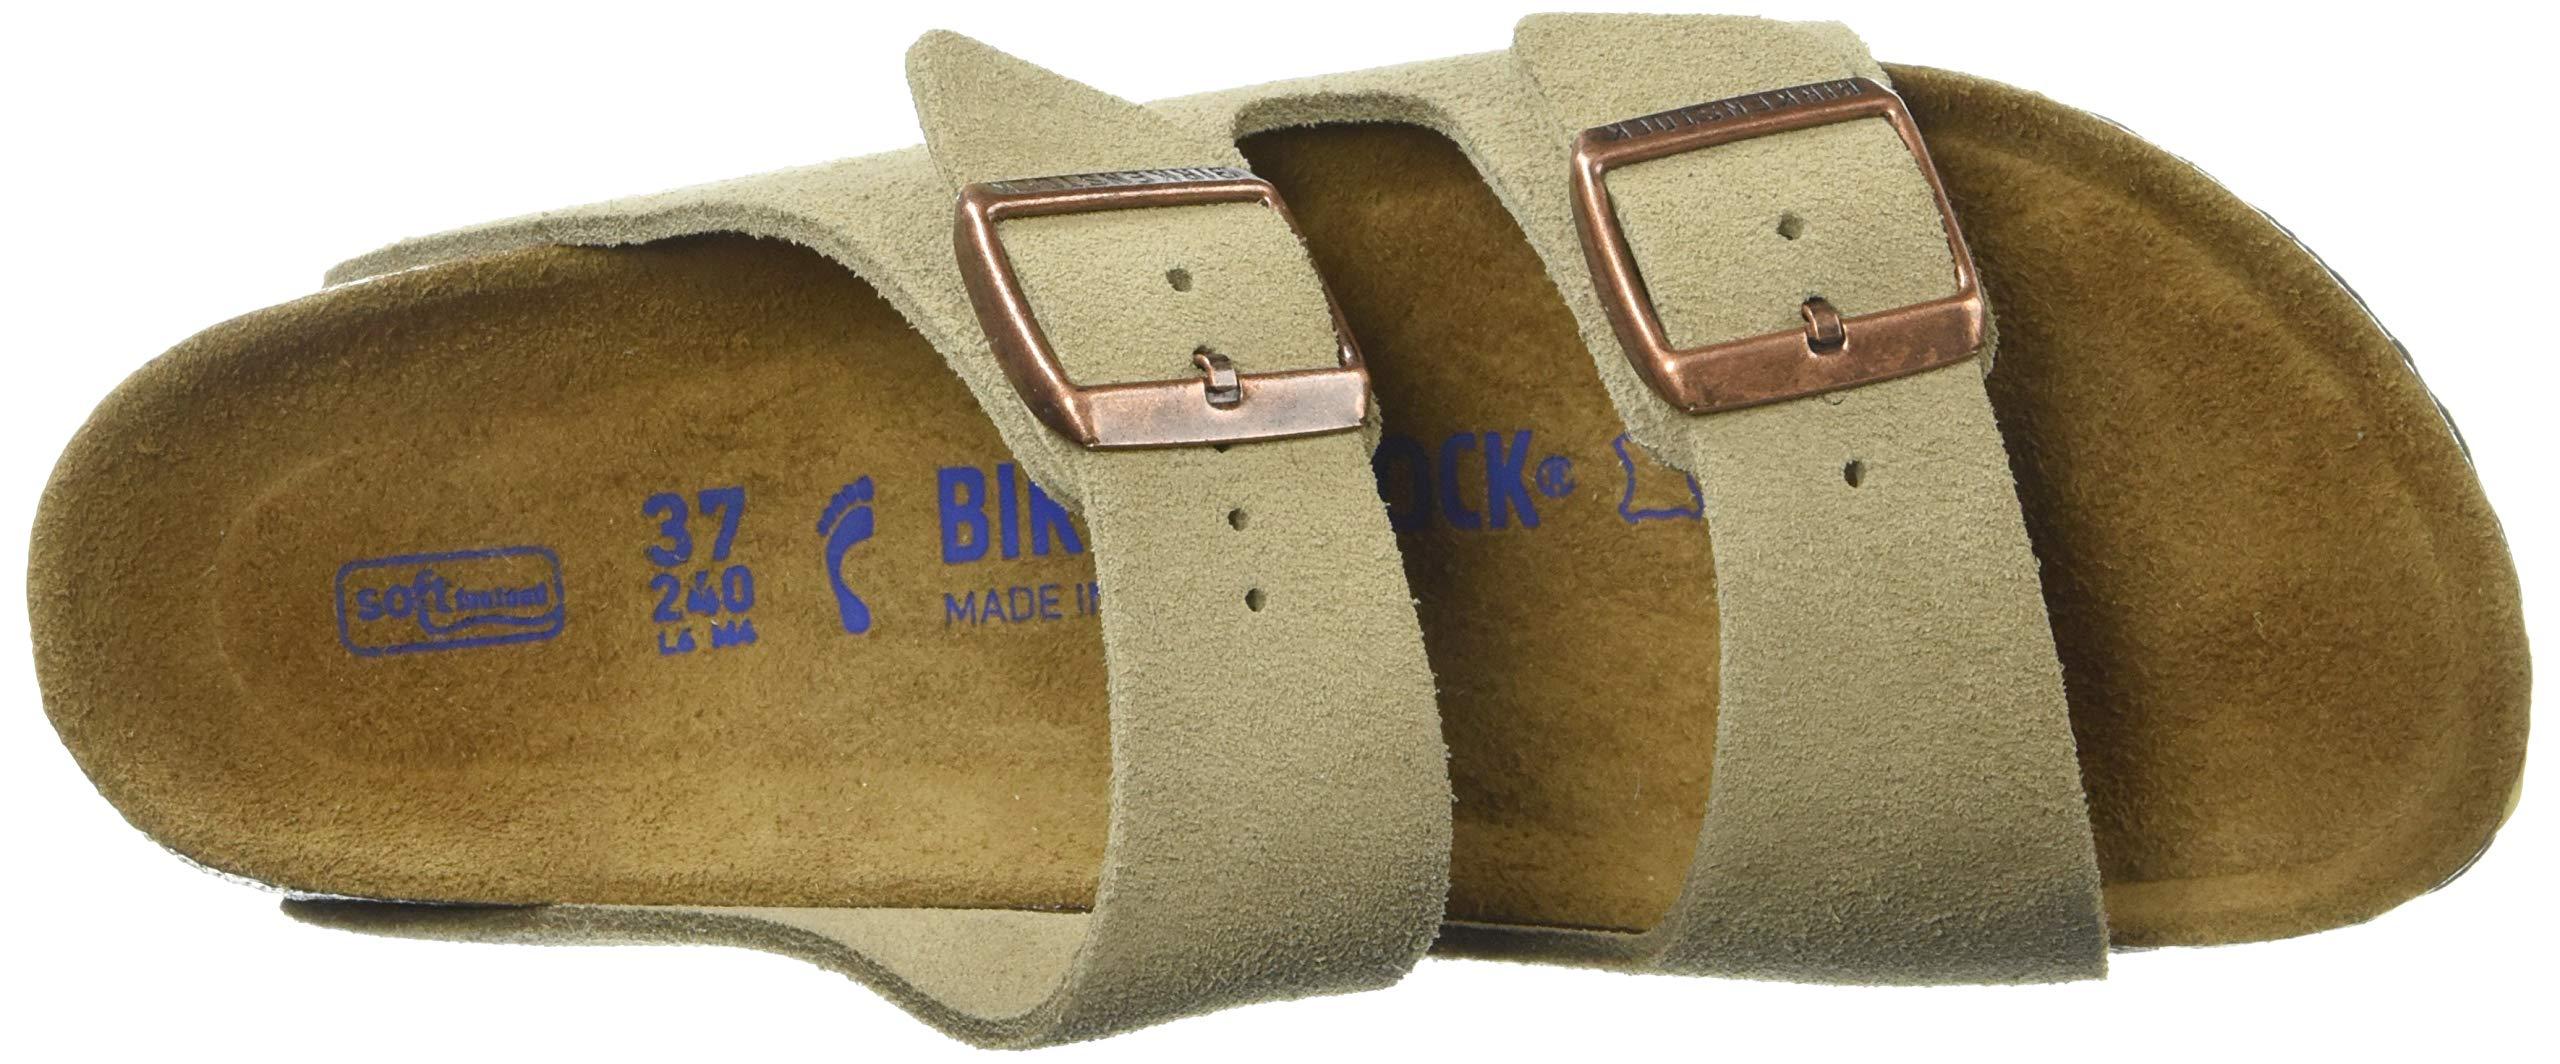 Birkenstock Arizona Soft Footbed Taupe Suede Regular Width - EU Size 35 / Women's US Sizes 4-4.5 by Birkenstock (Image #8)